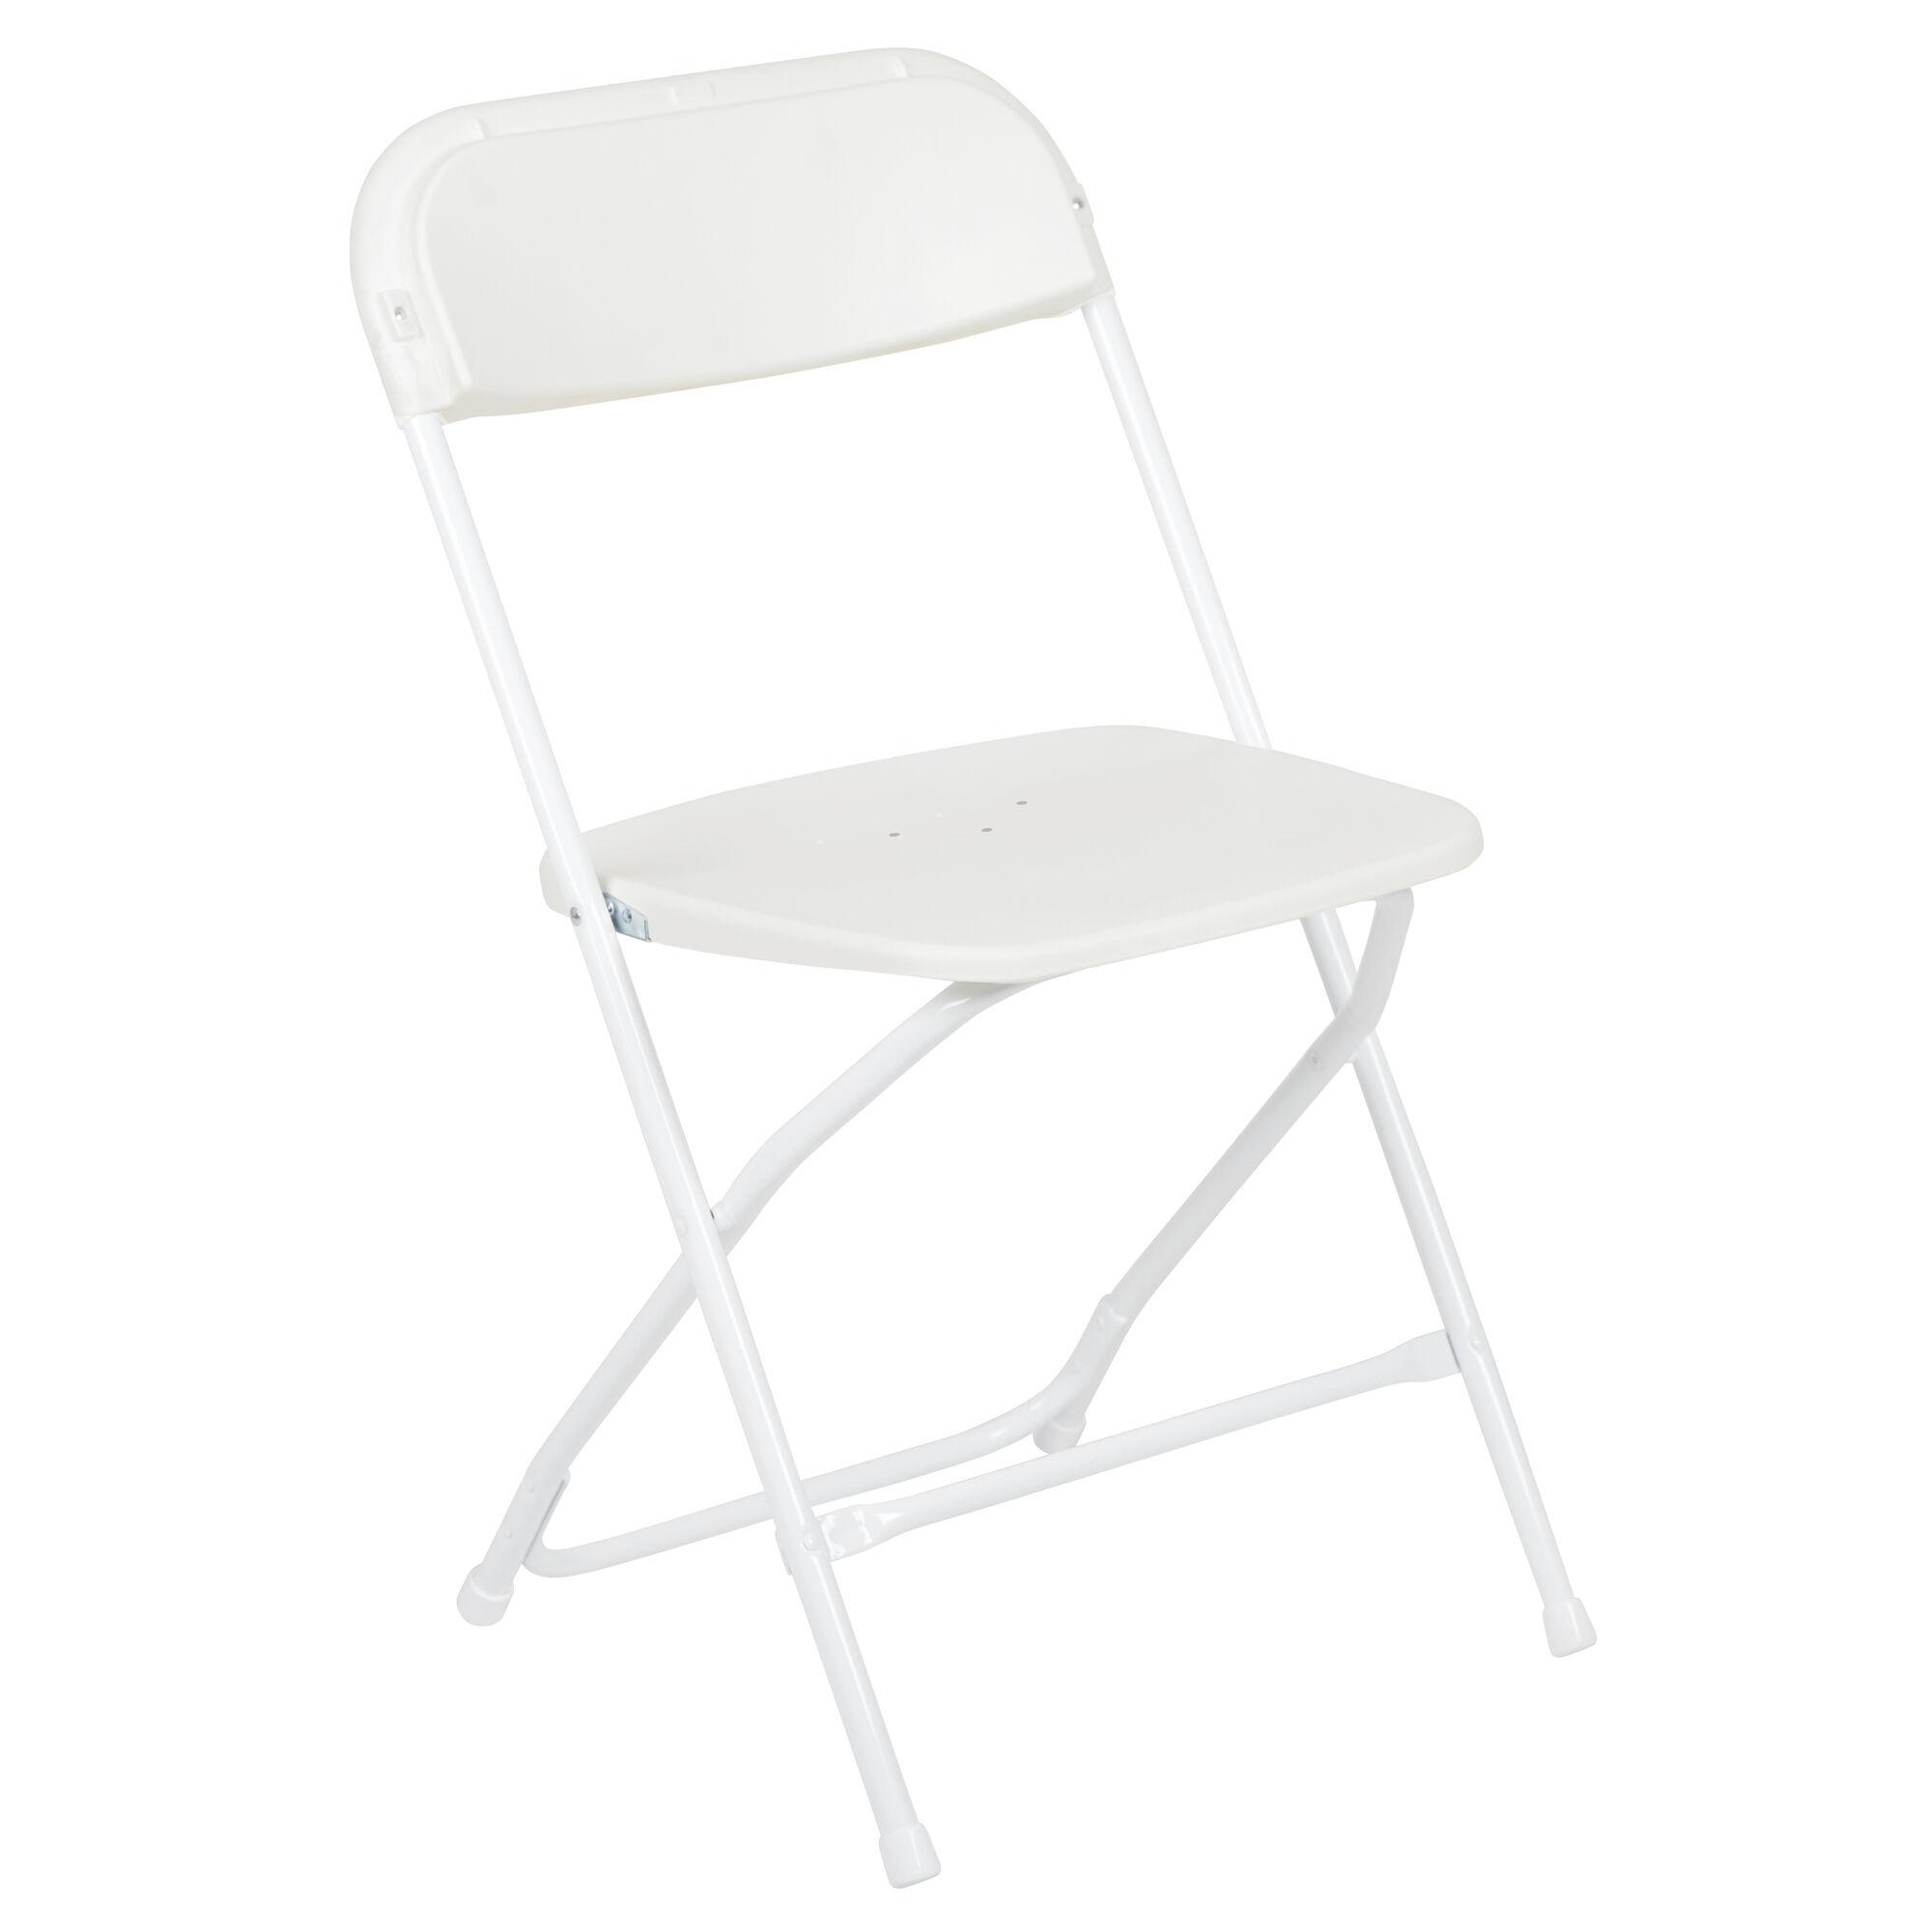 RestaurantFurniture4Less Restaurant Folding Chairs